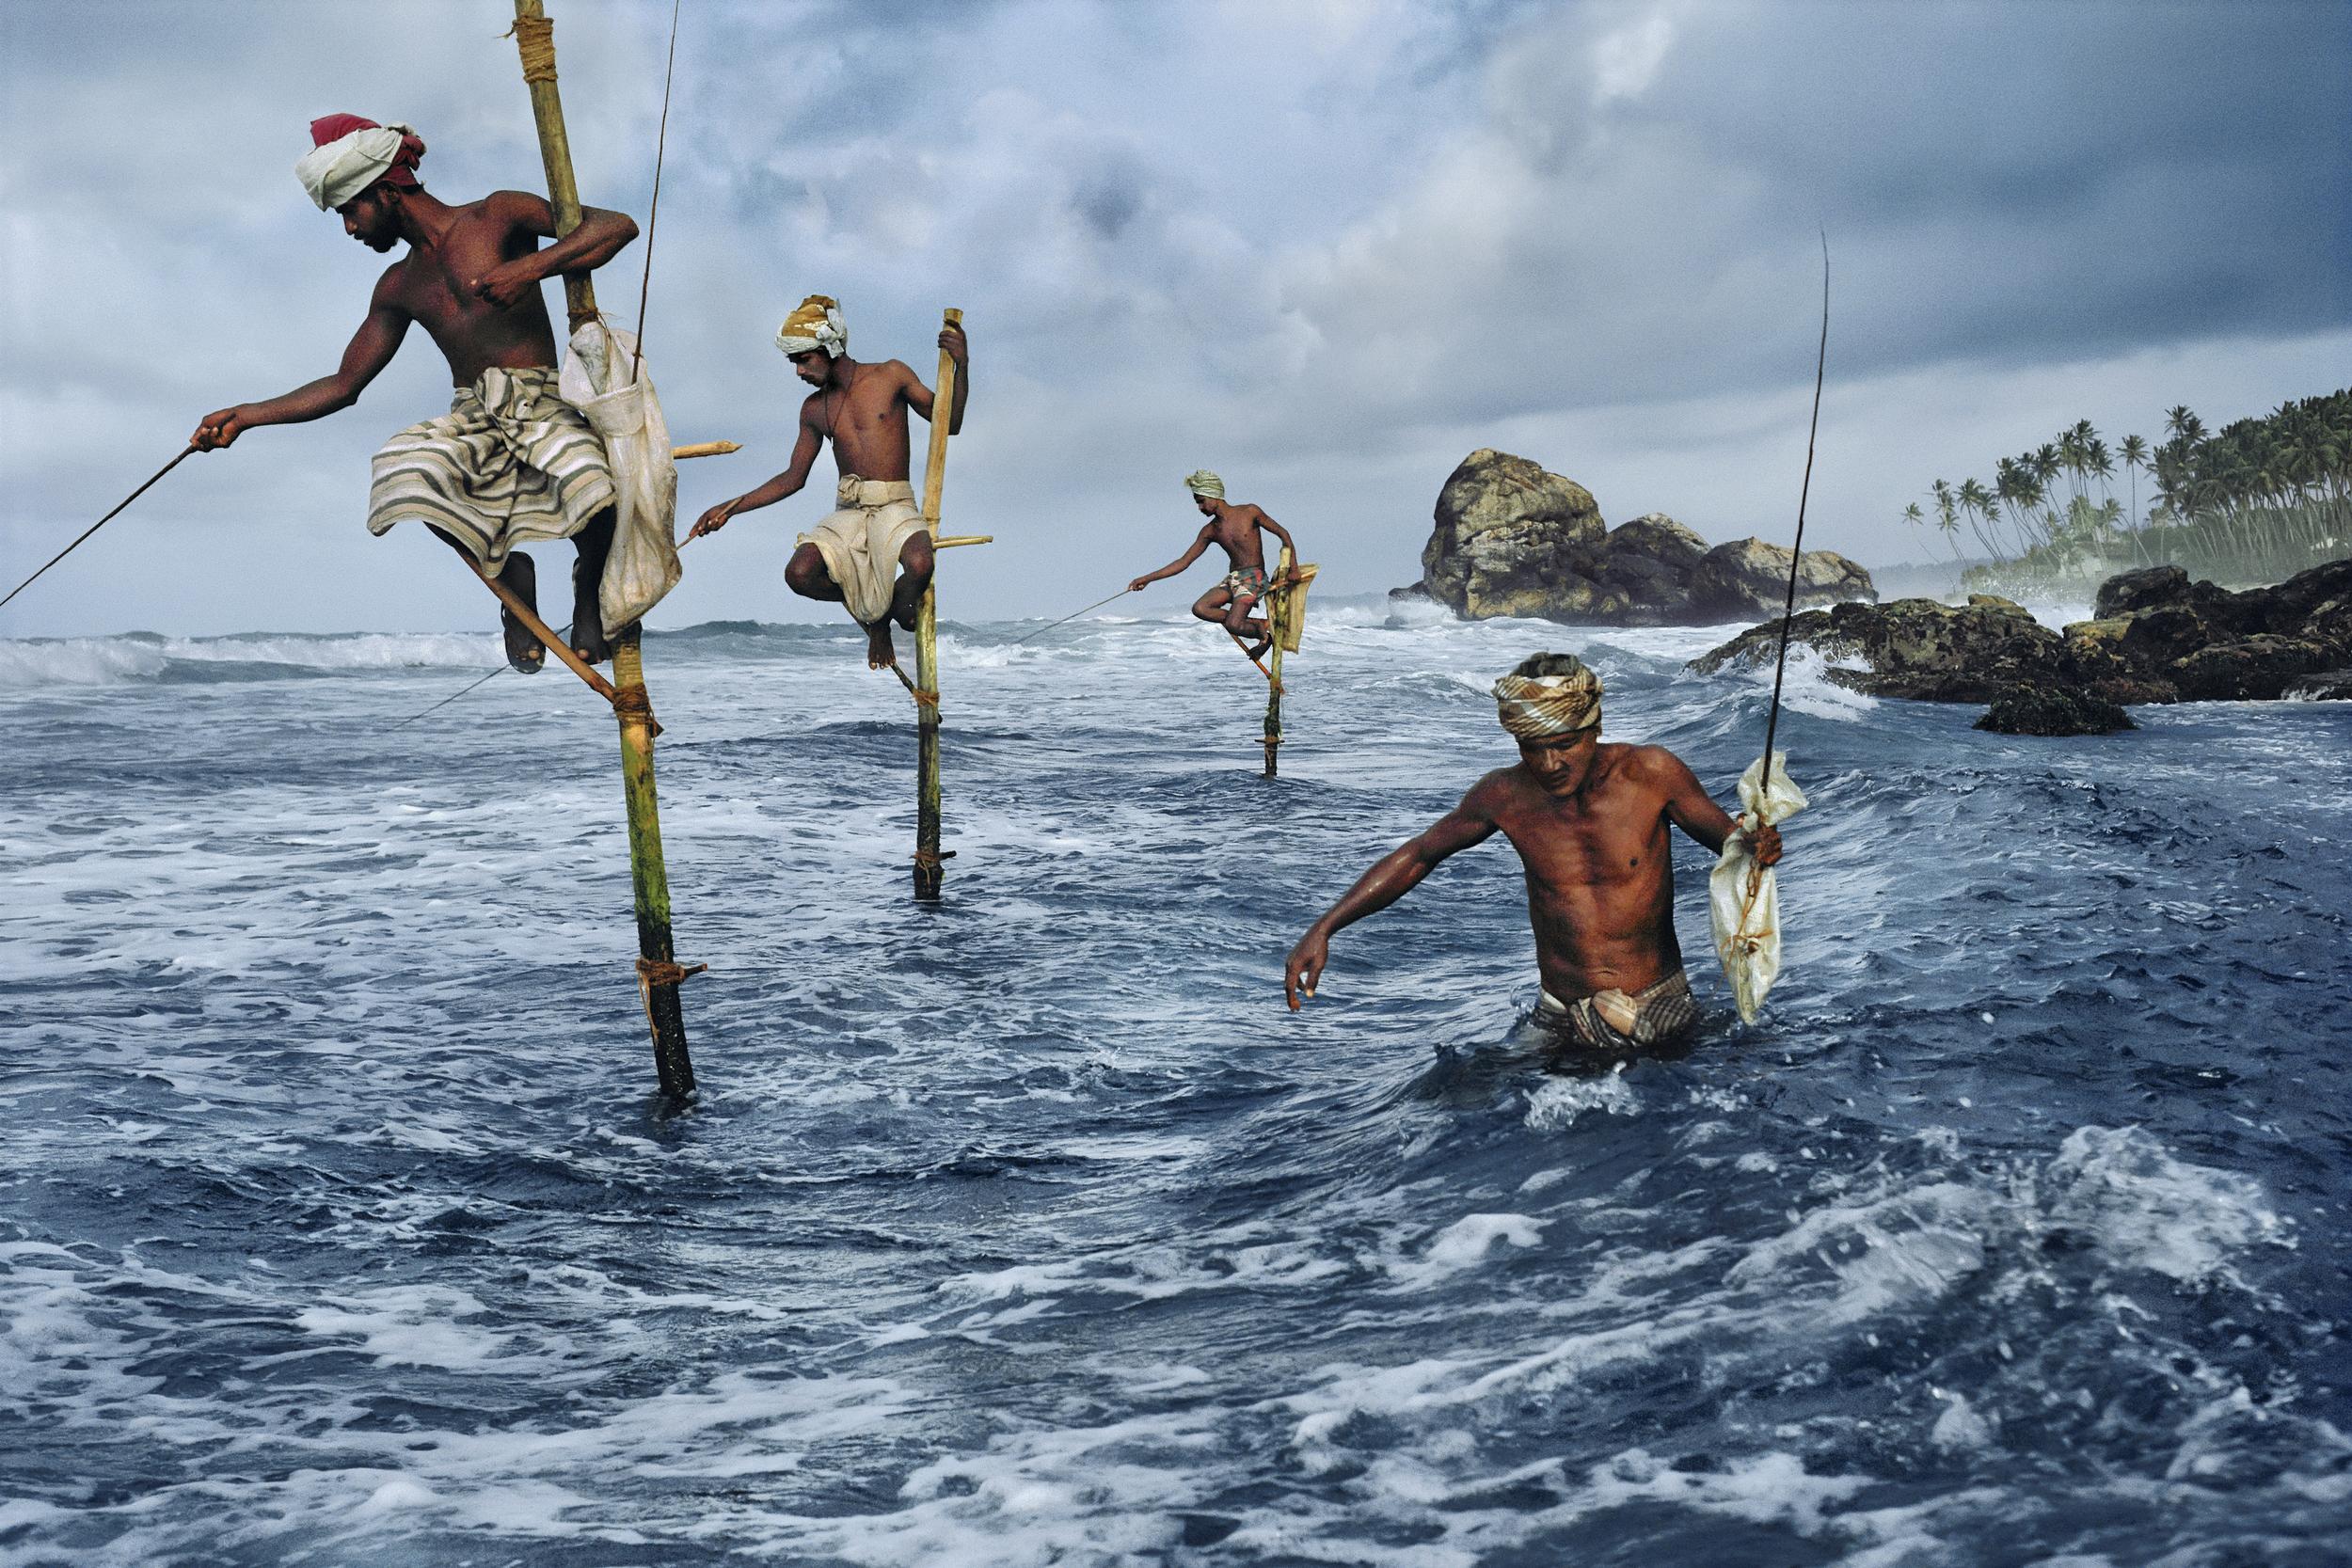 Image above: ©Steve McCurry, Stilt Fishermen, South Coast, Sri Lanka, 1995, chromogenic print on Fuji Crystal,Archive paper